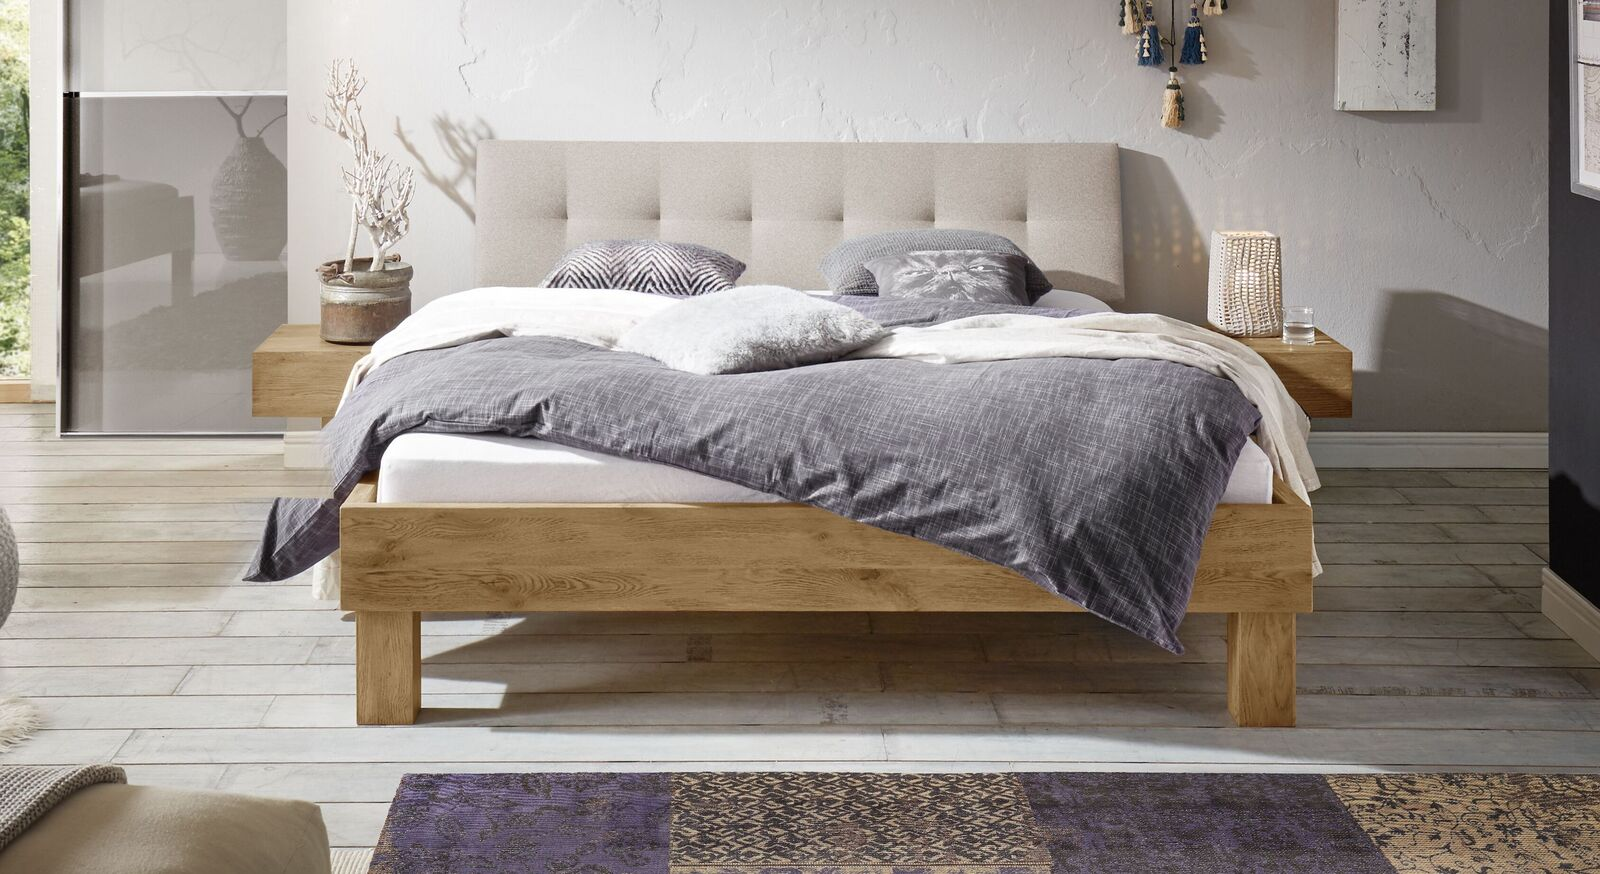 Bett Santa Luiza aus stabilem Wildeichenholz